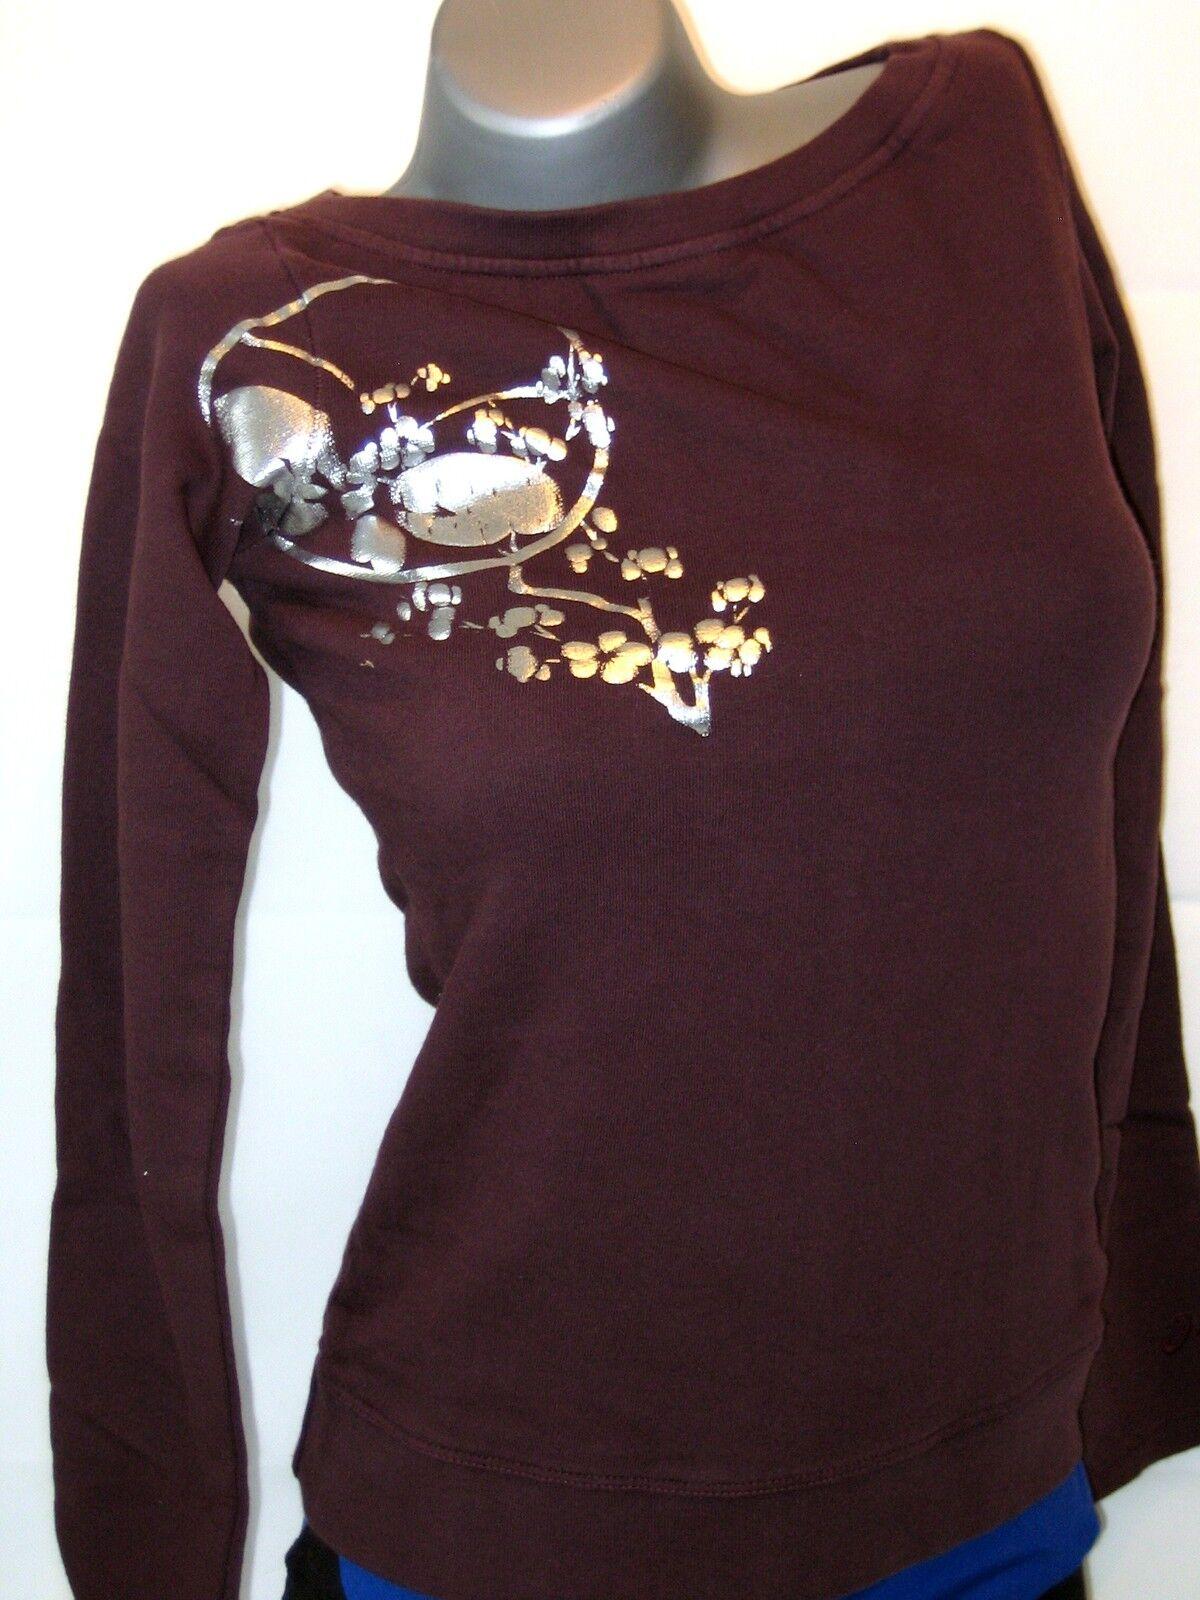 ASICS Women's Sweatshirt Size S Brown  NEW Idoru Sweatshirt  factory outlet